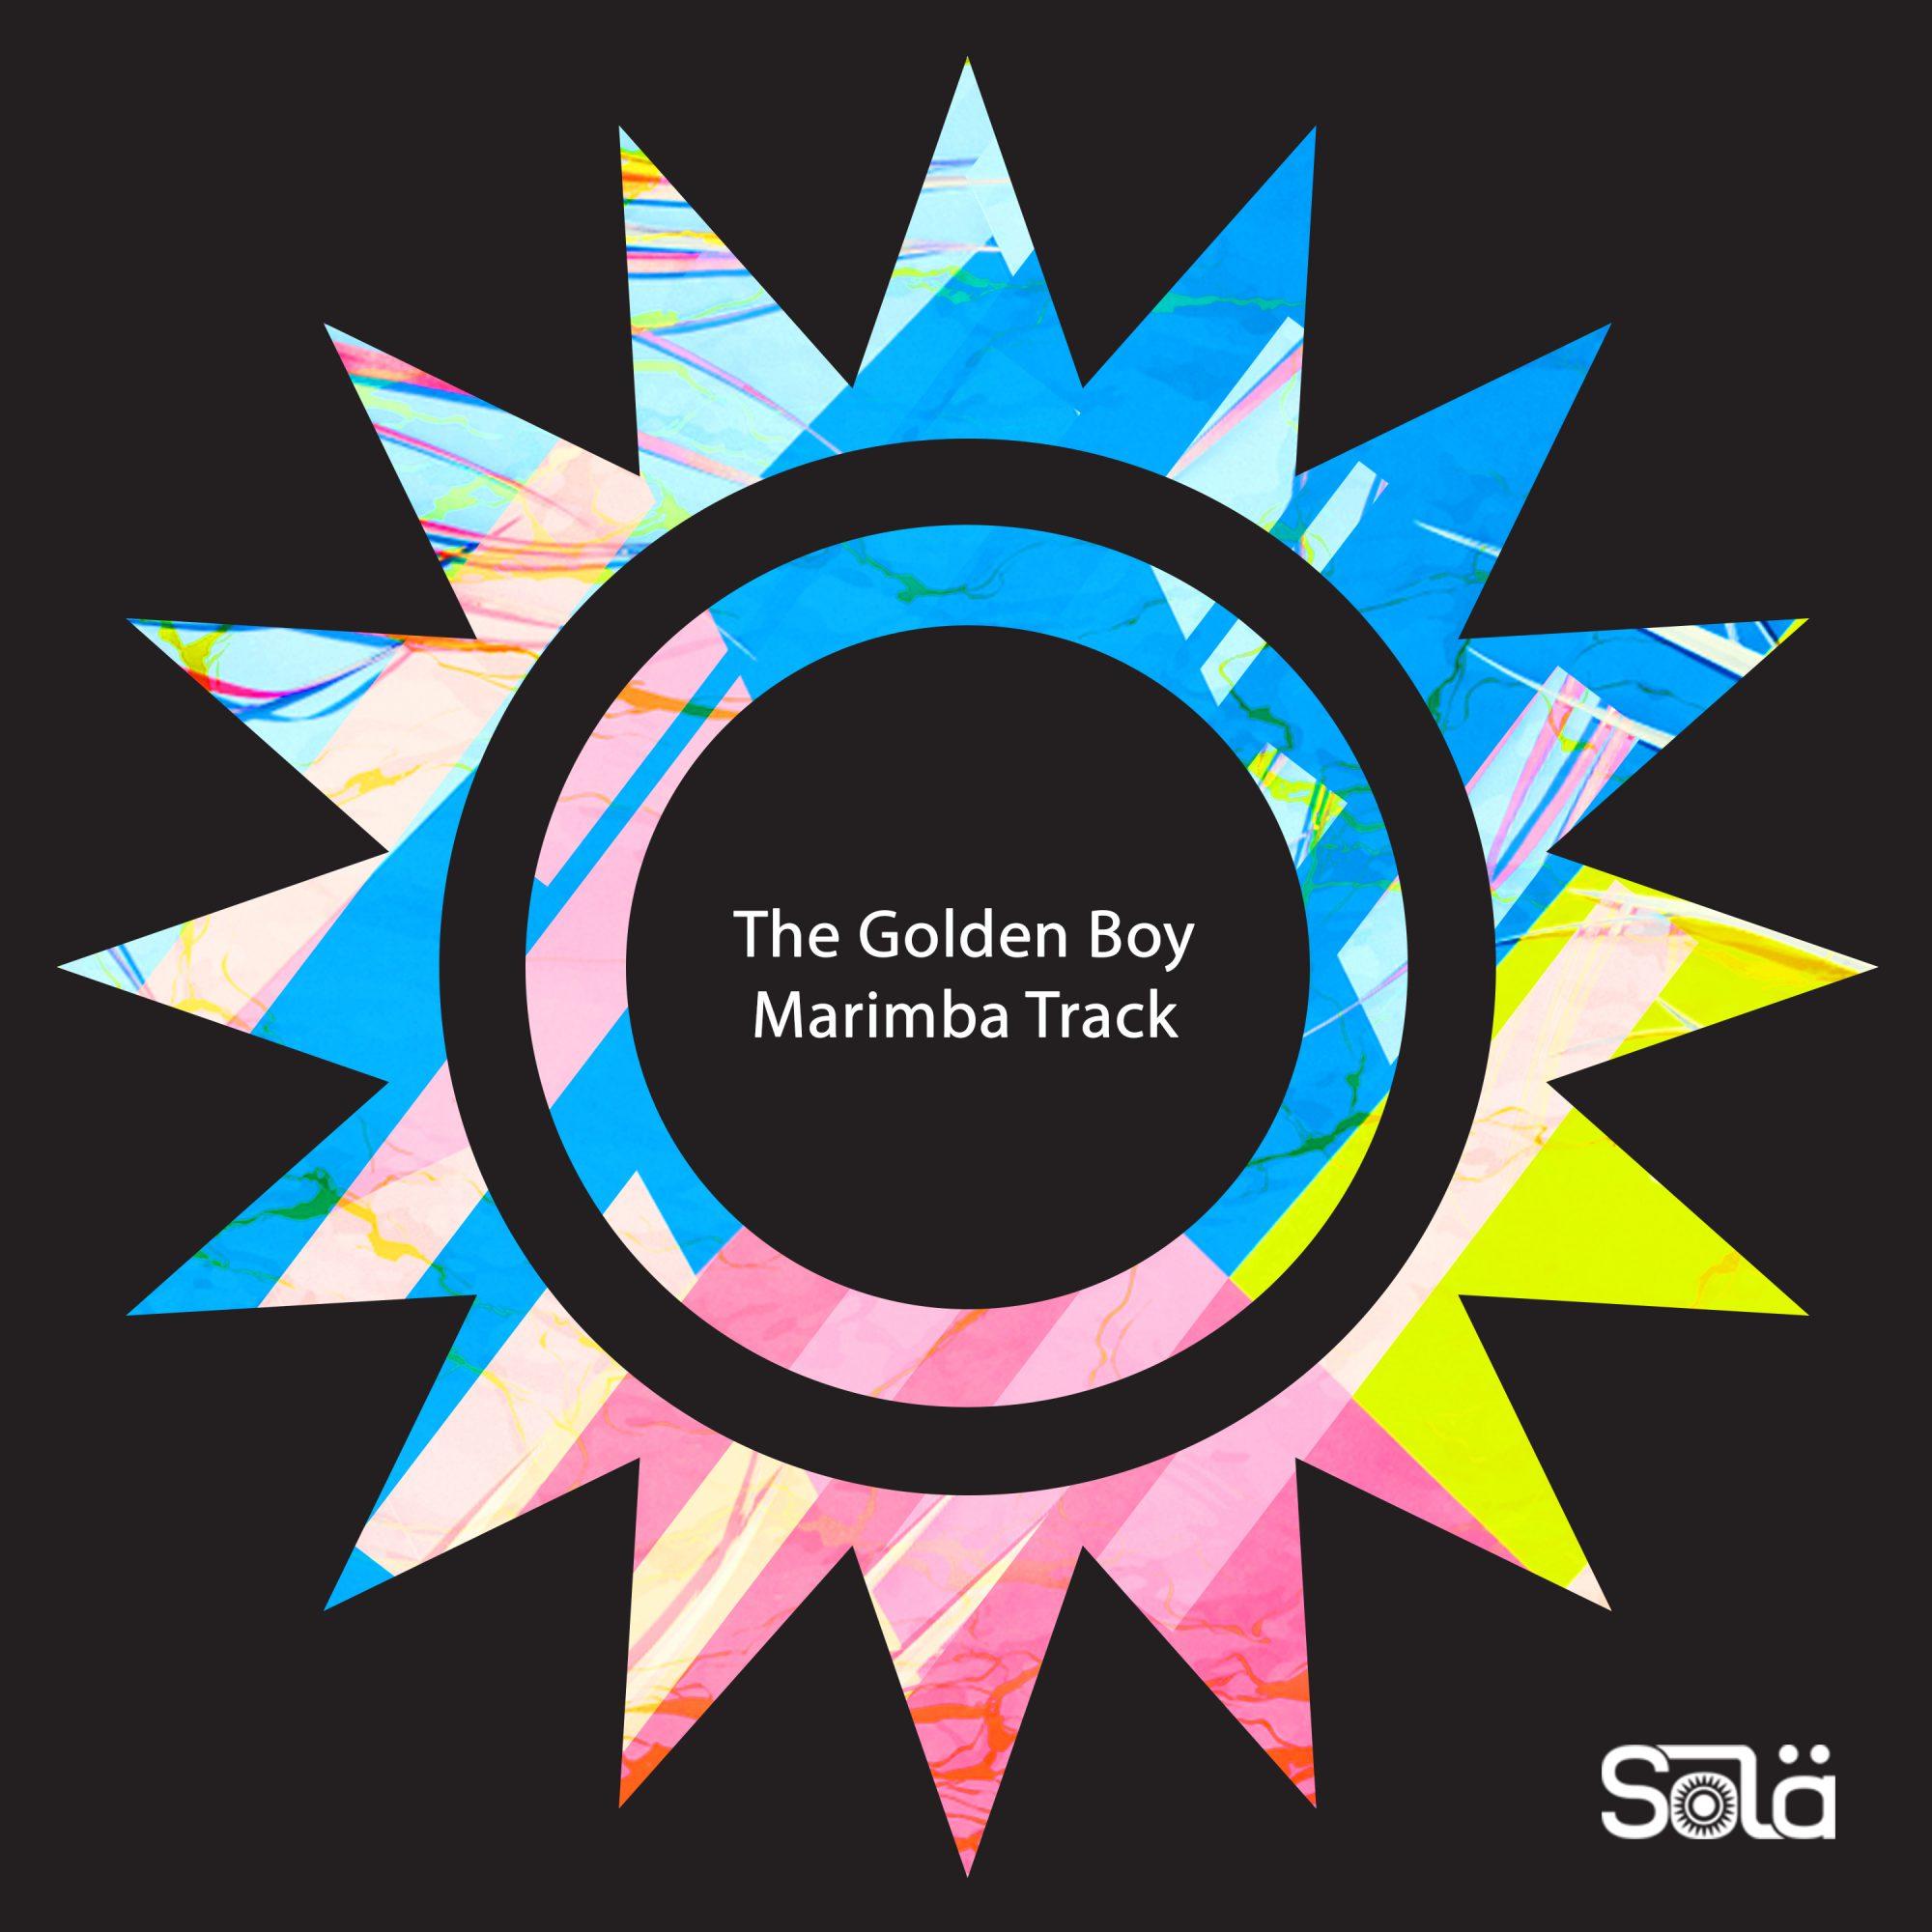 The Golden Boy - Marimba Track